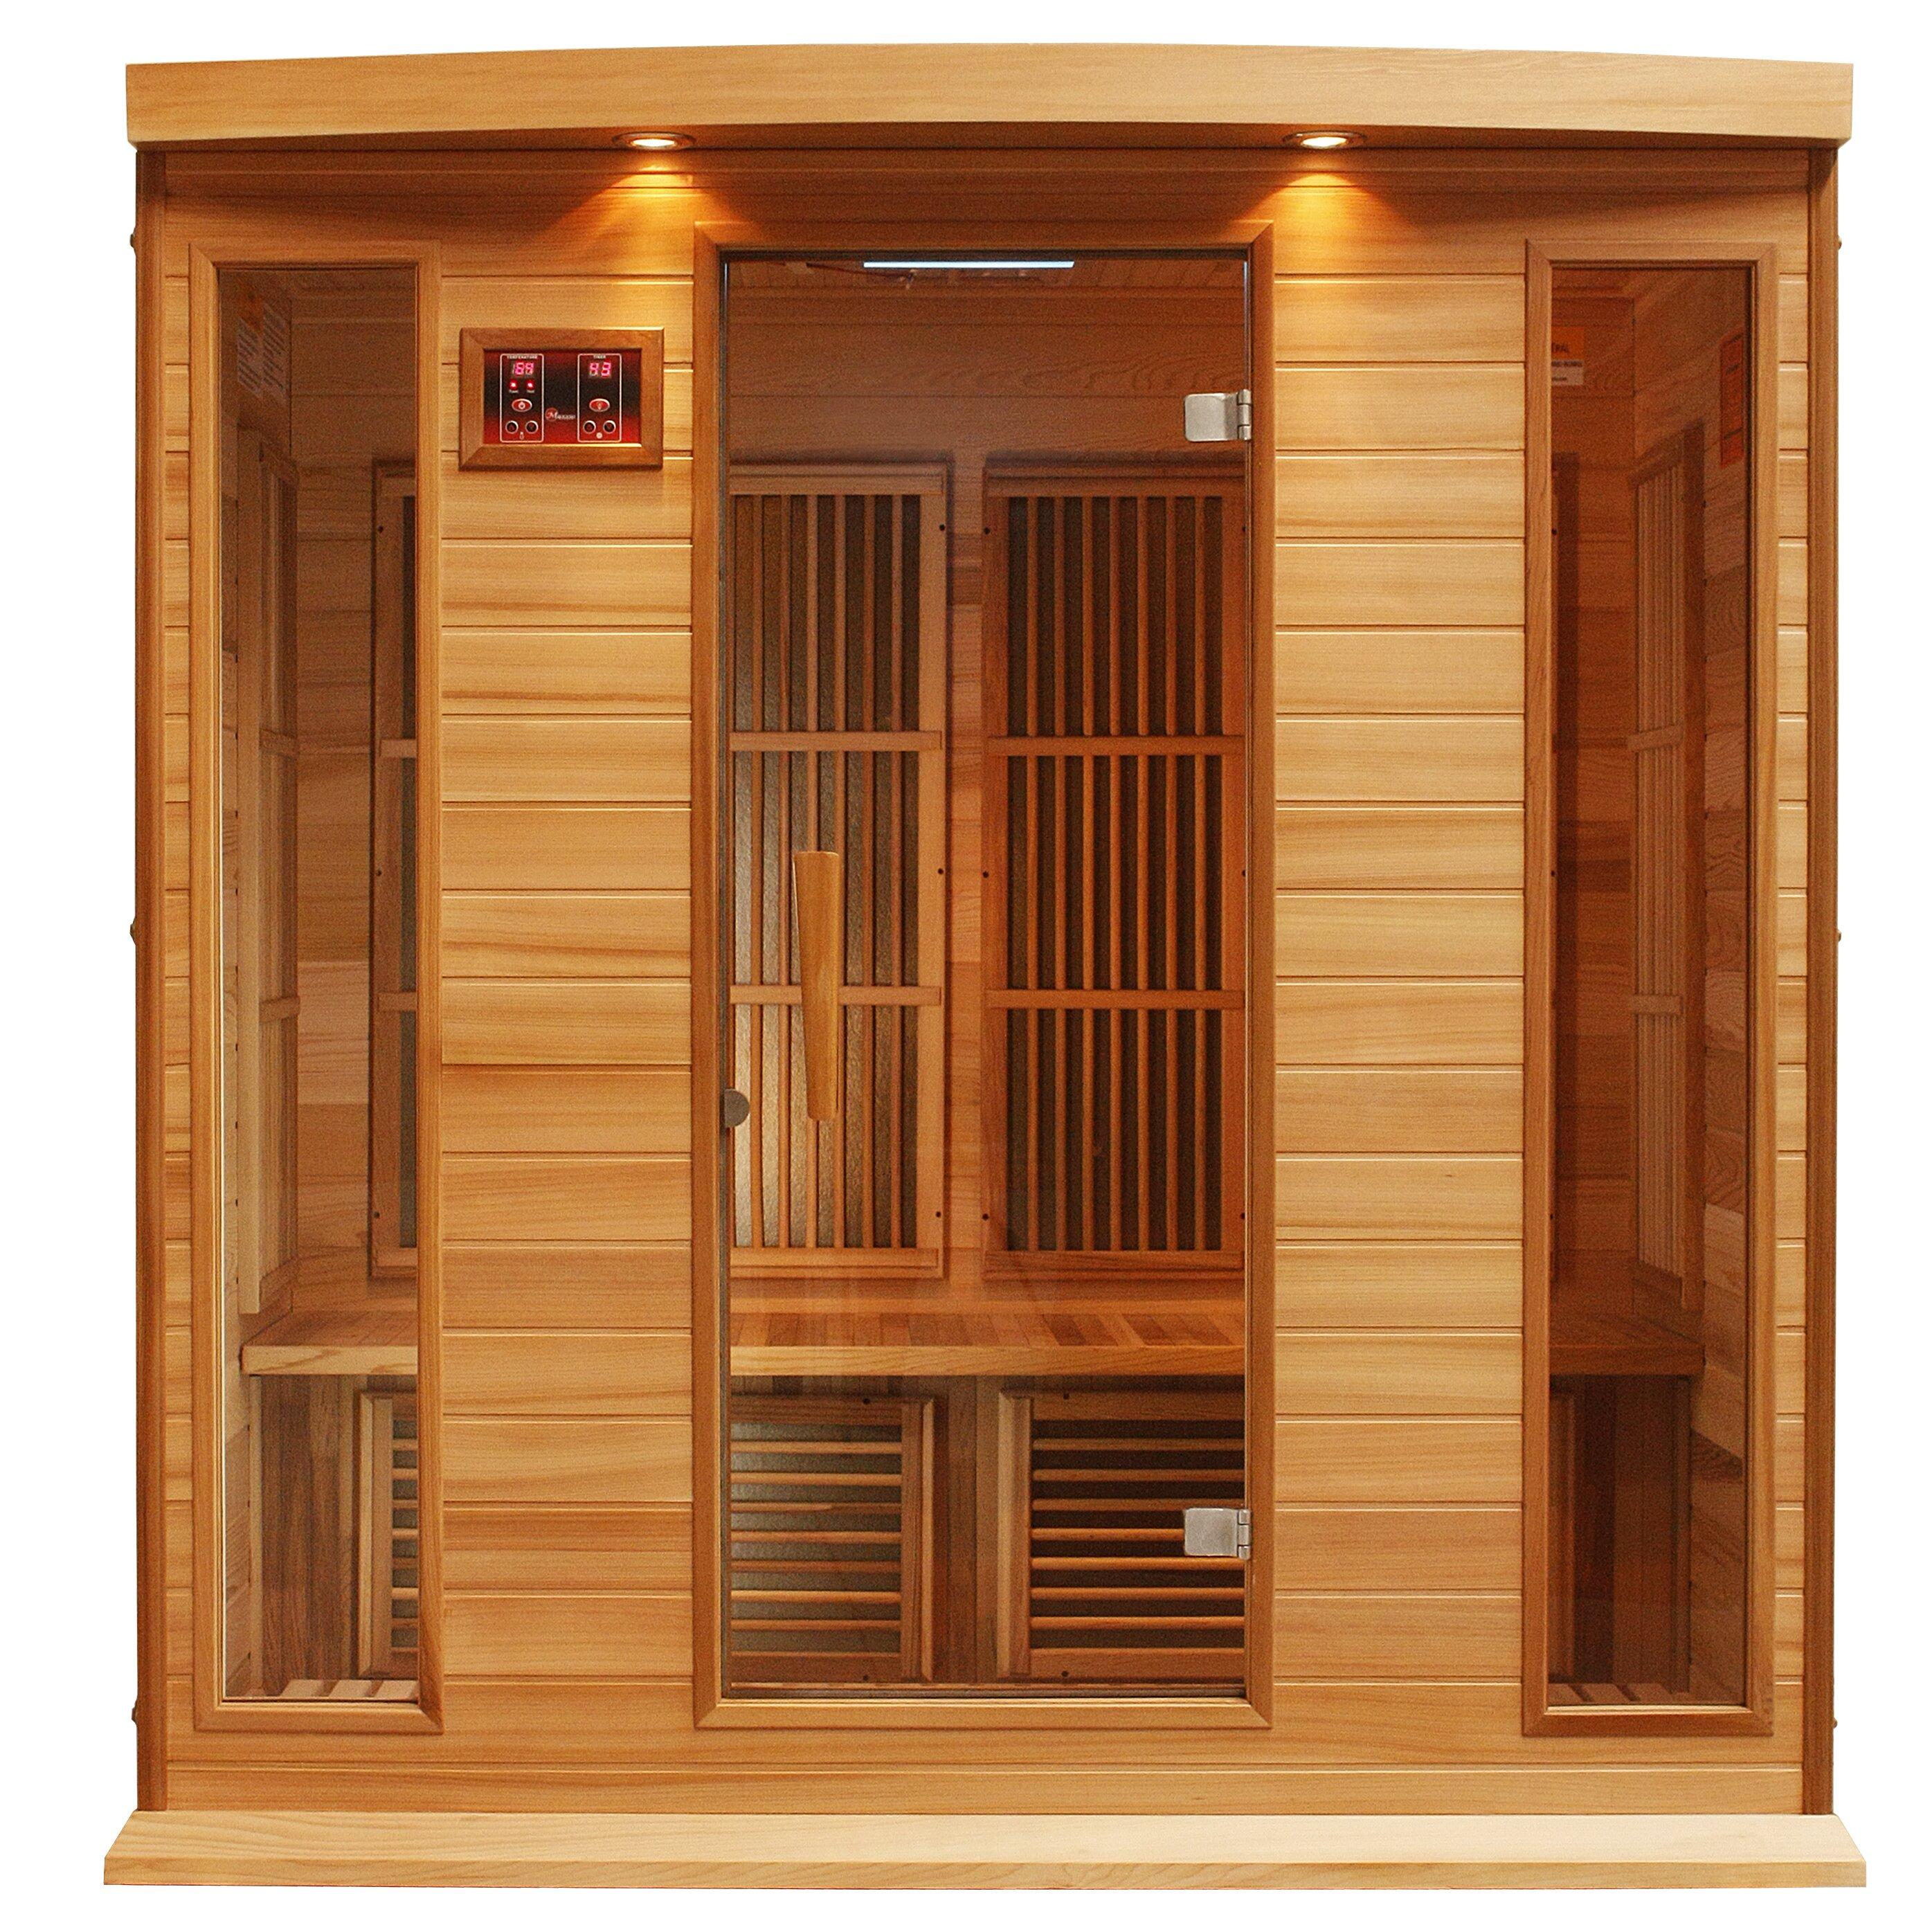 maxxus 4 person carbon far infrared sauna reviews wayfair. Black Bedroom Furniture Sets. Home Design Ideas